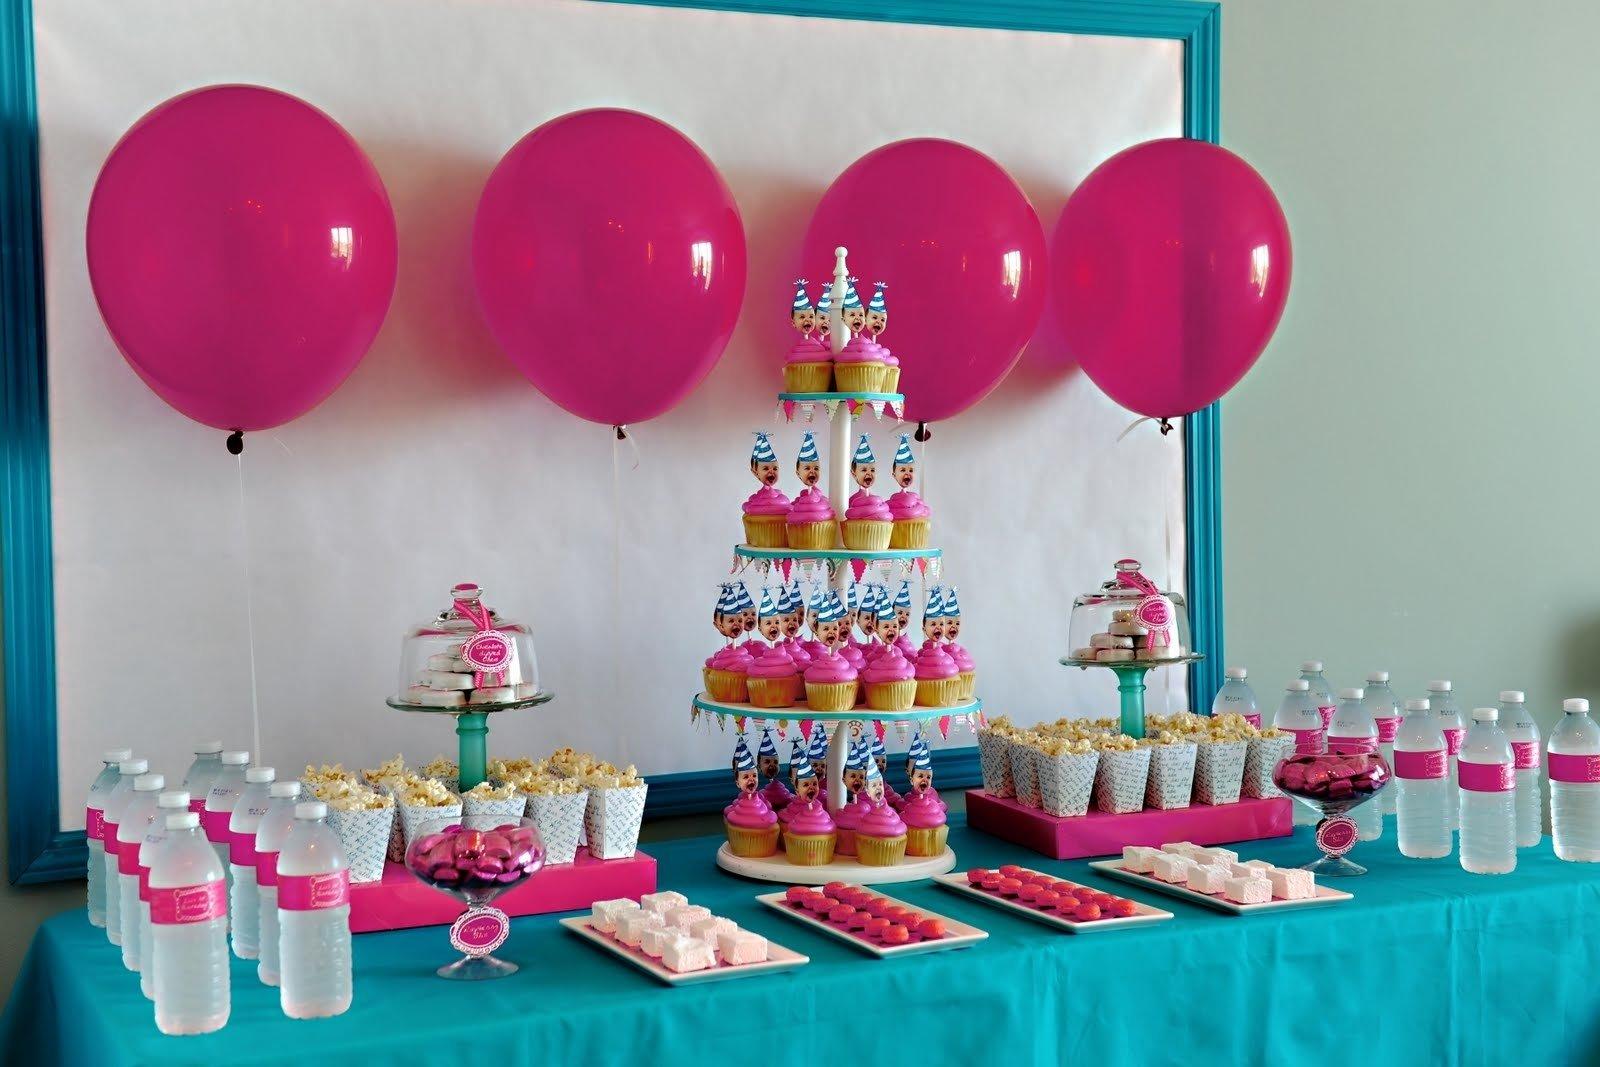 10 Trendy 10 Yr Old Girl Birthday Party Ideas 10 year old birthday party ideas teenage birthday party ideas 4 2020